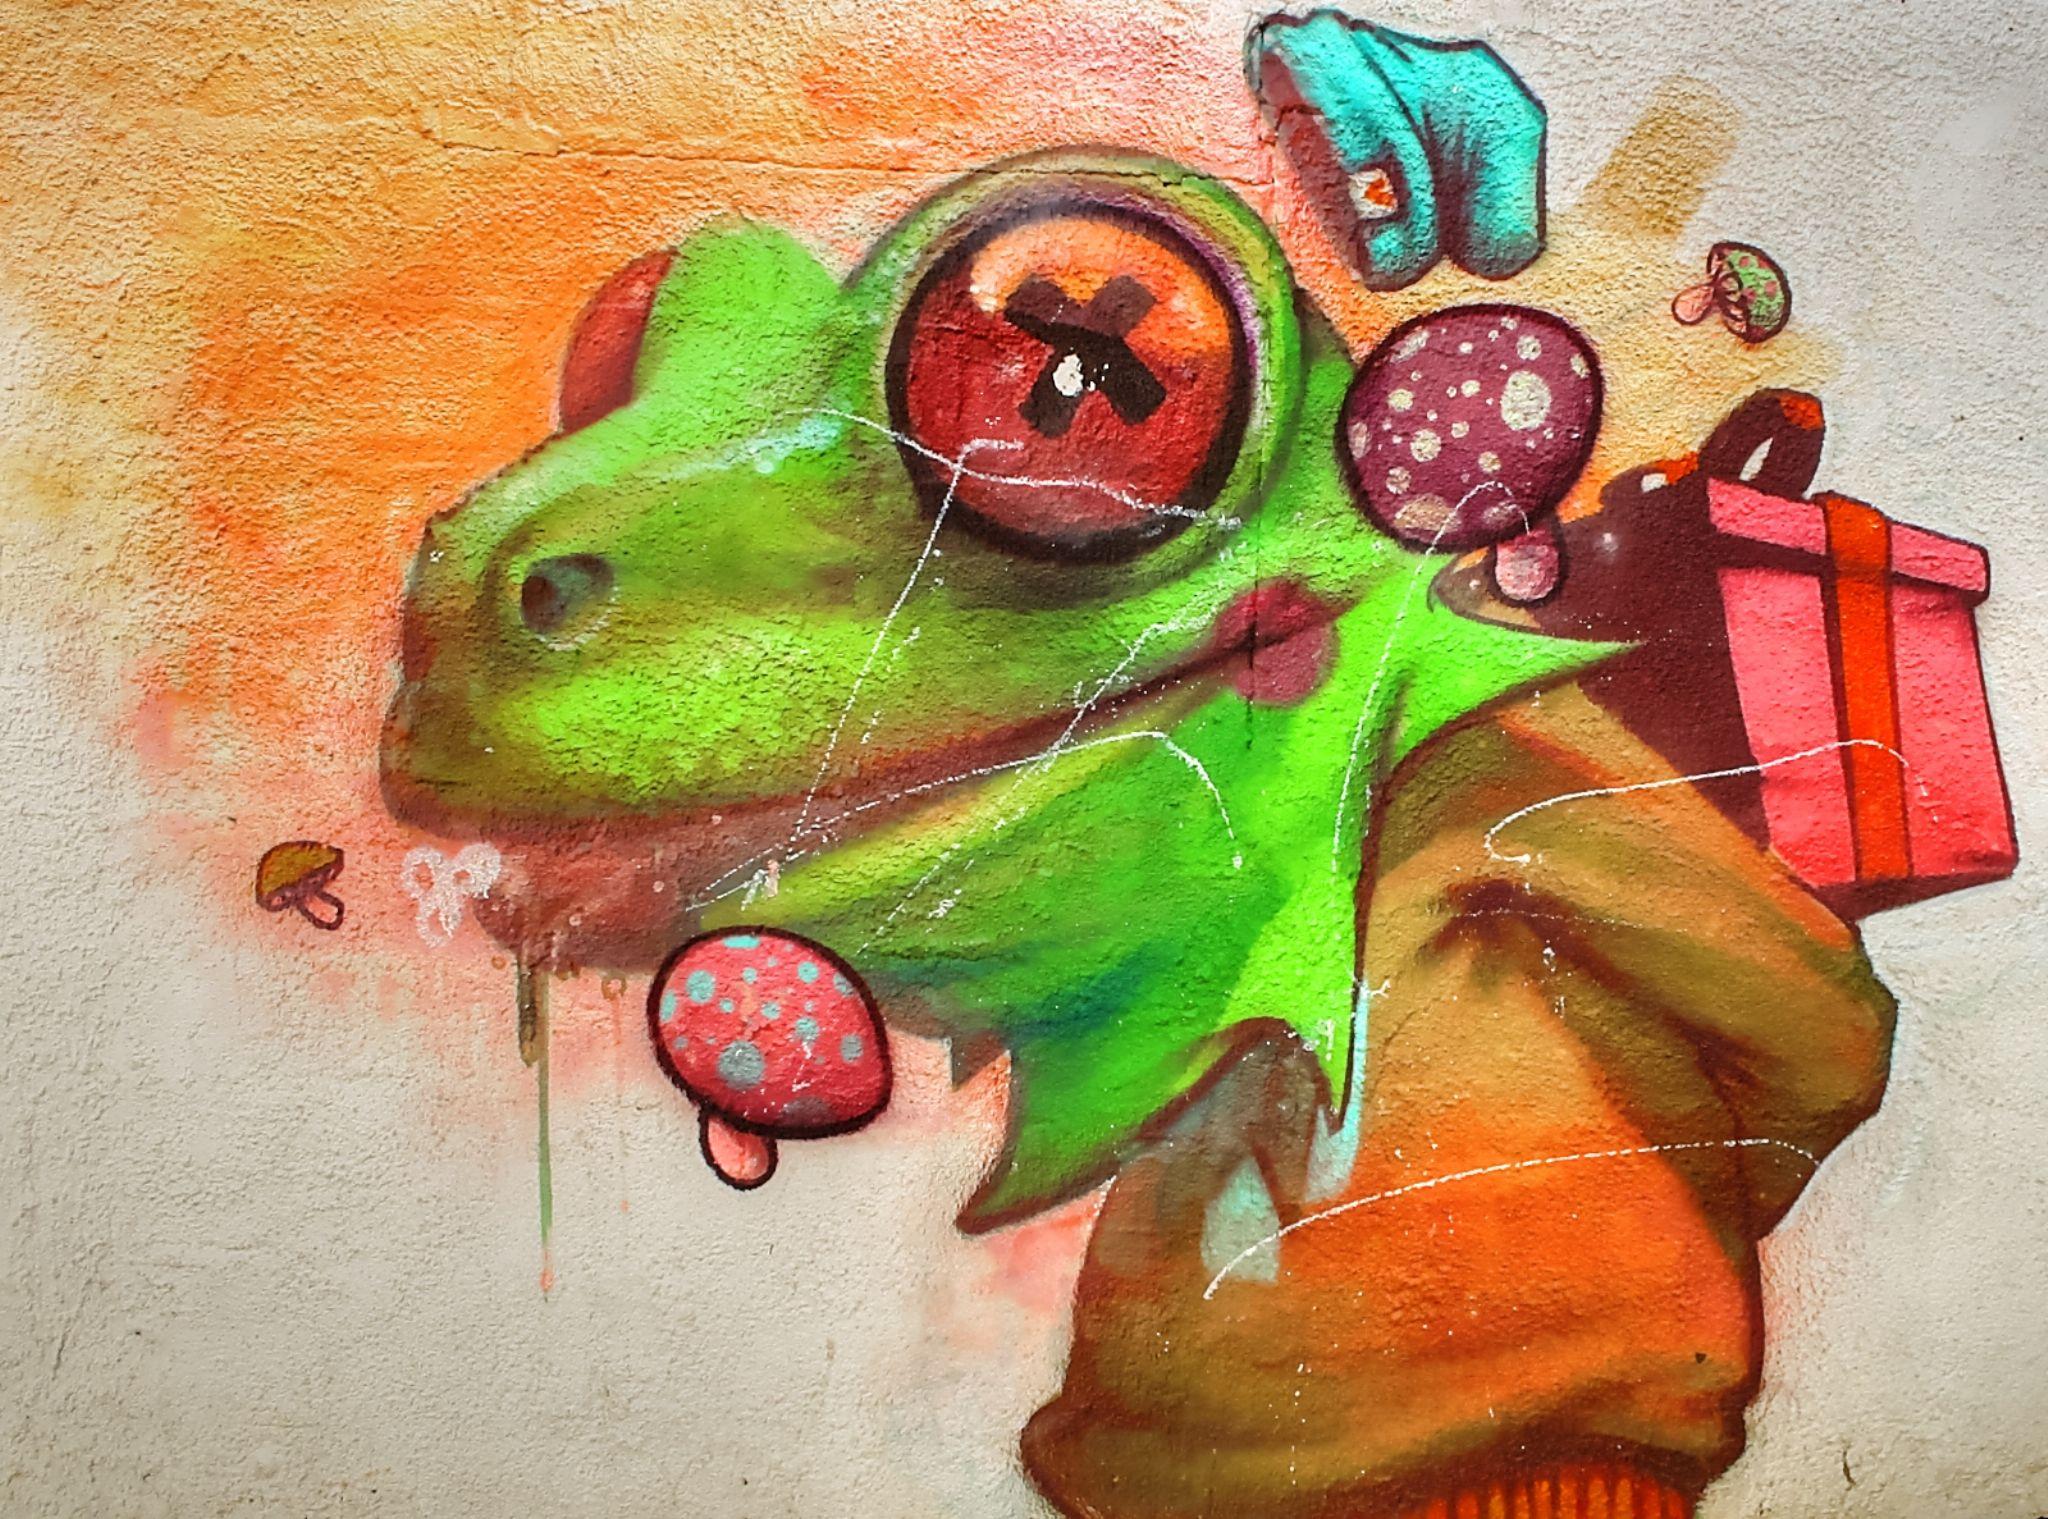 Urban Art by Ricardo Santos